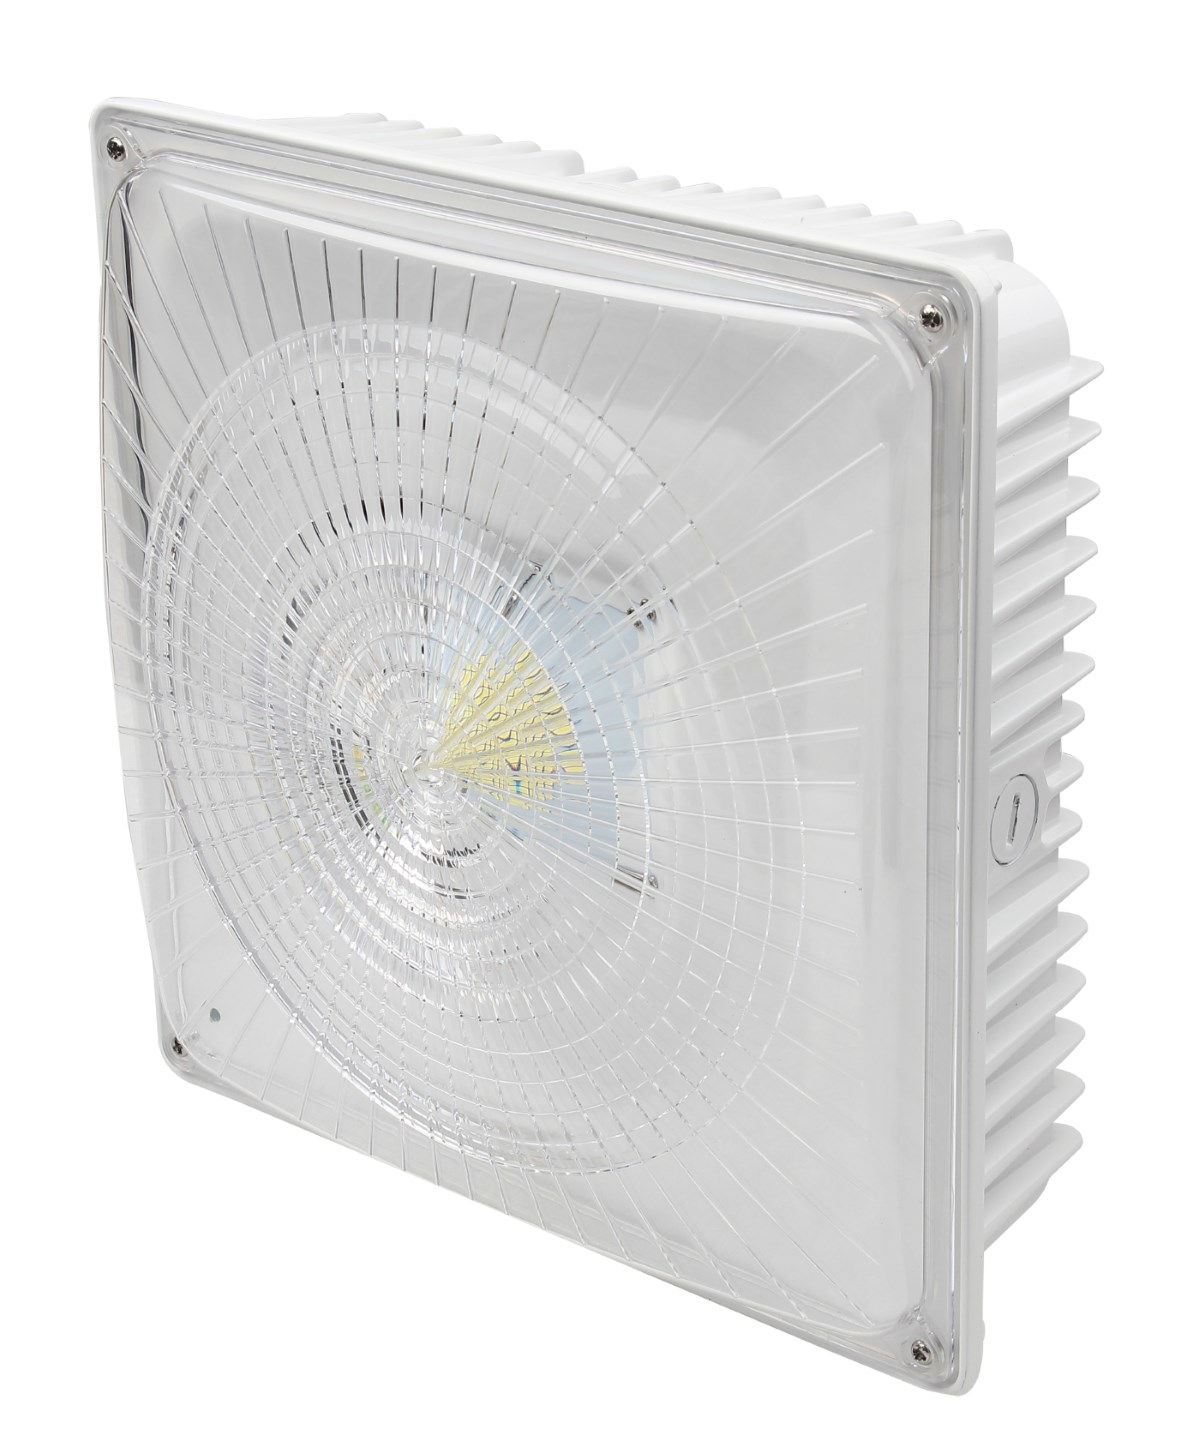 100 watt led ceiling light 12 000 lumens canopy light. Black Bedroom Furniture Sets. Home Design Ideas